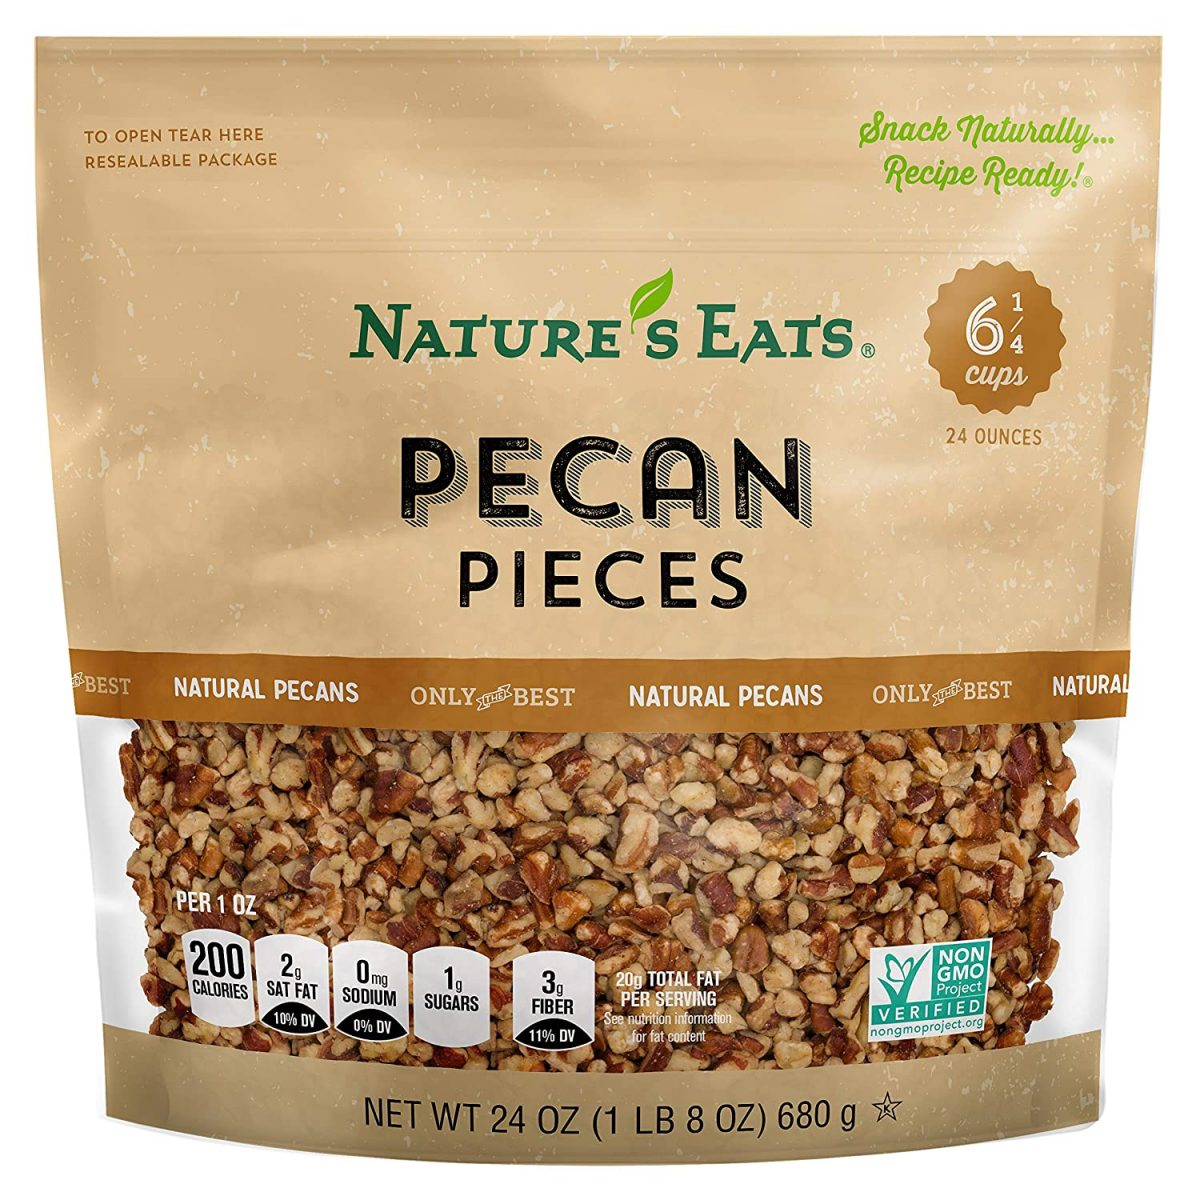 Nature's Eats Pecan Pieces